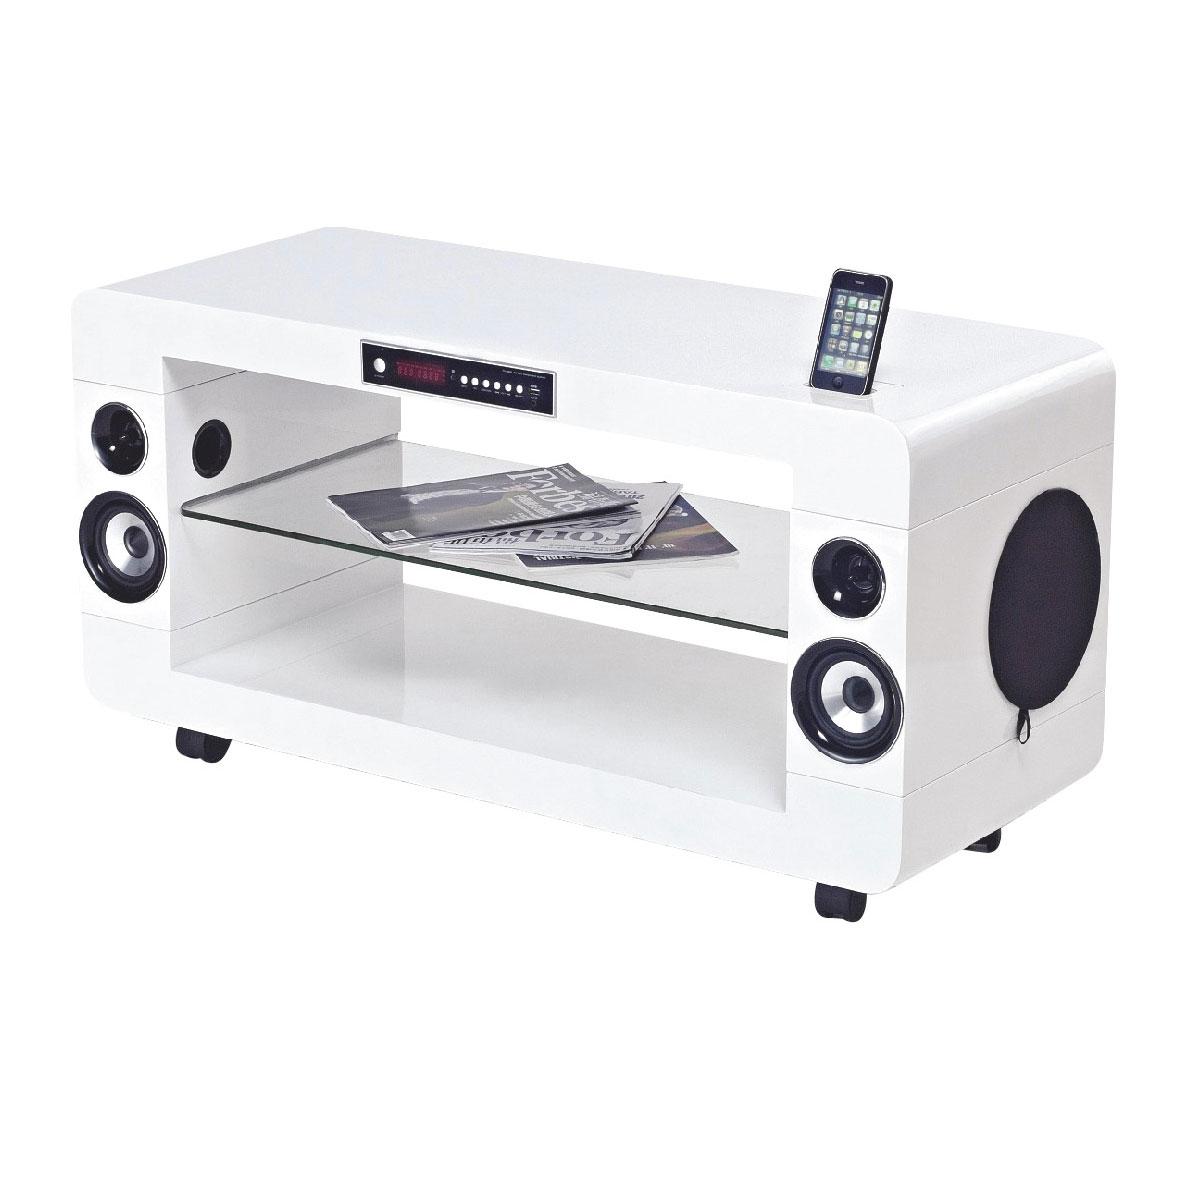 soundvision sv 230 w blanc ensemble home cin ma soundvision sur. Black Bedroom Furniture Sets. Home Design Ideas